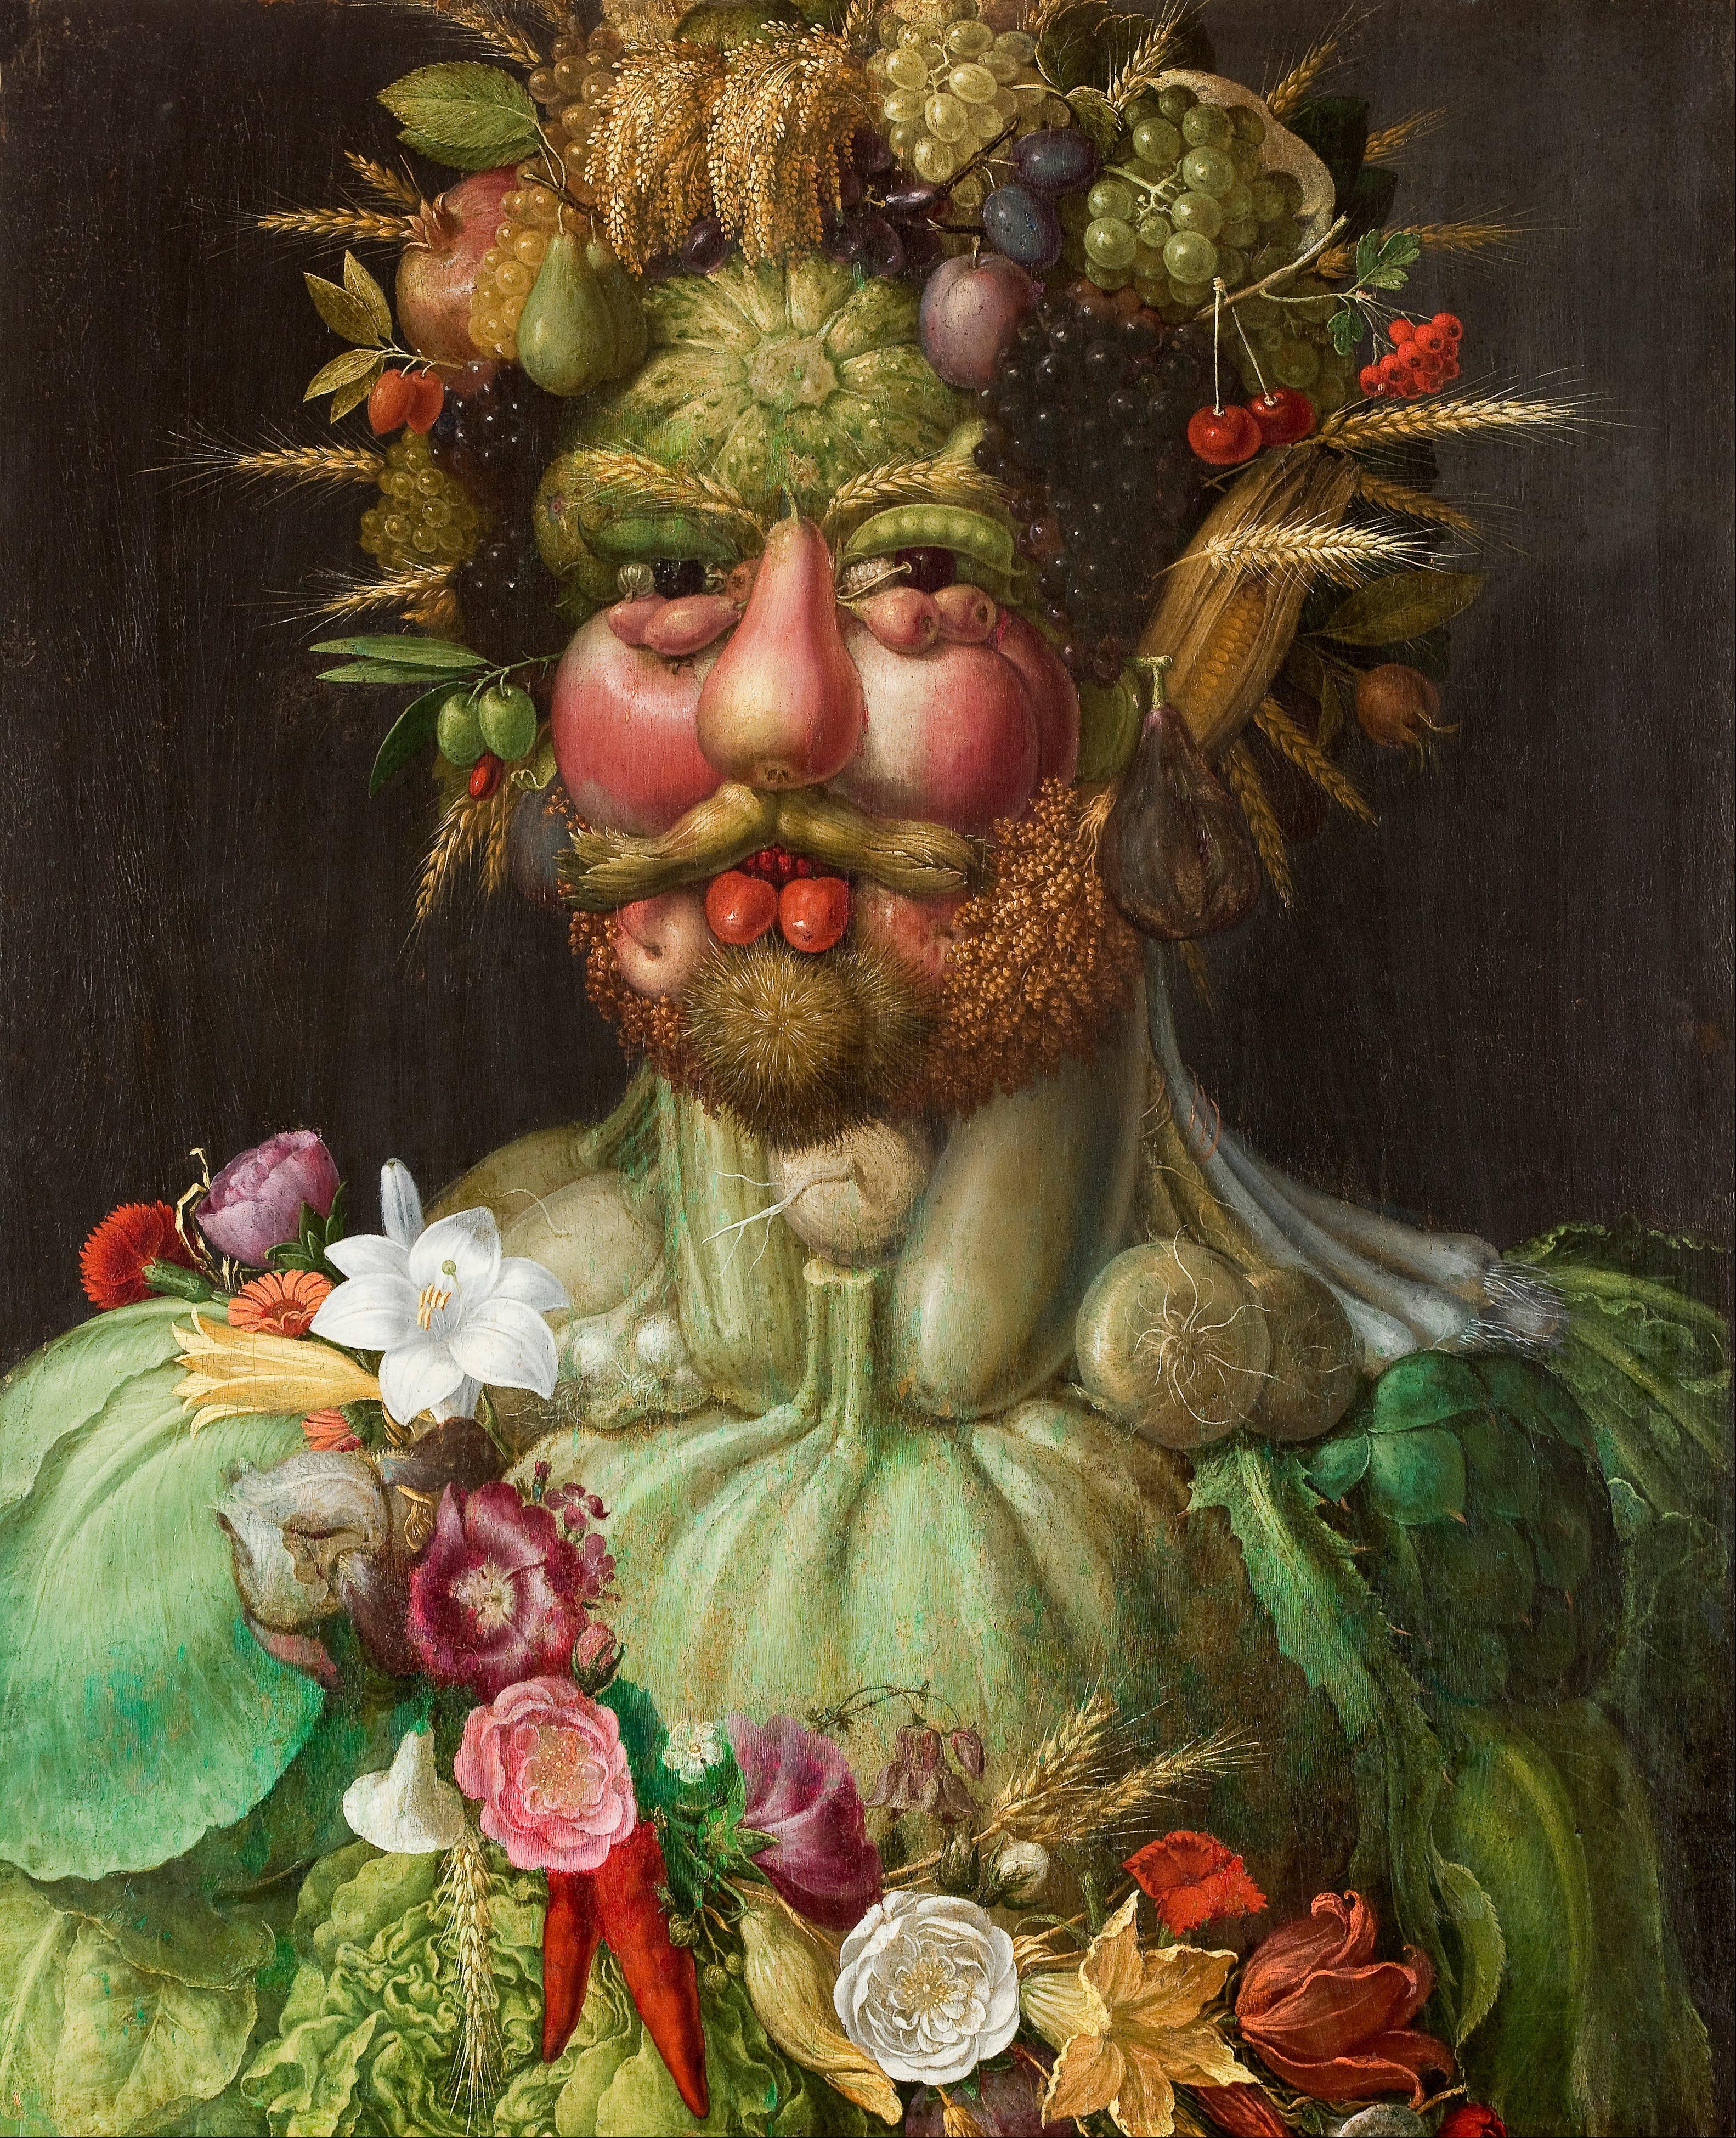 giuseppe_arcimboldo_-_rudolf_ii_of_habsburg_as_vertumnus_-_google_art_project